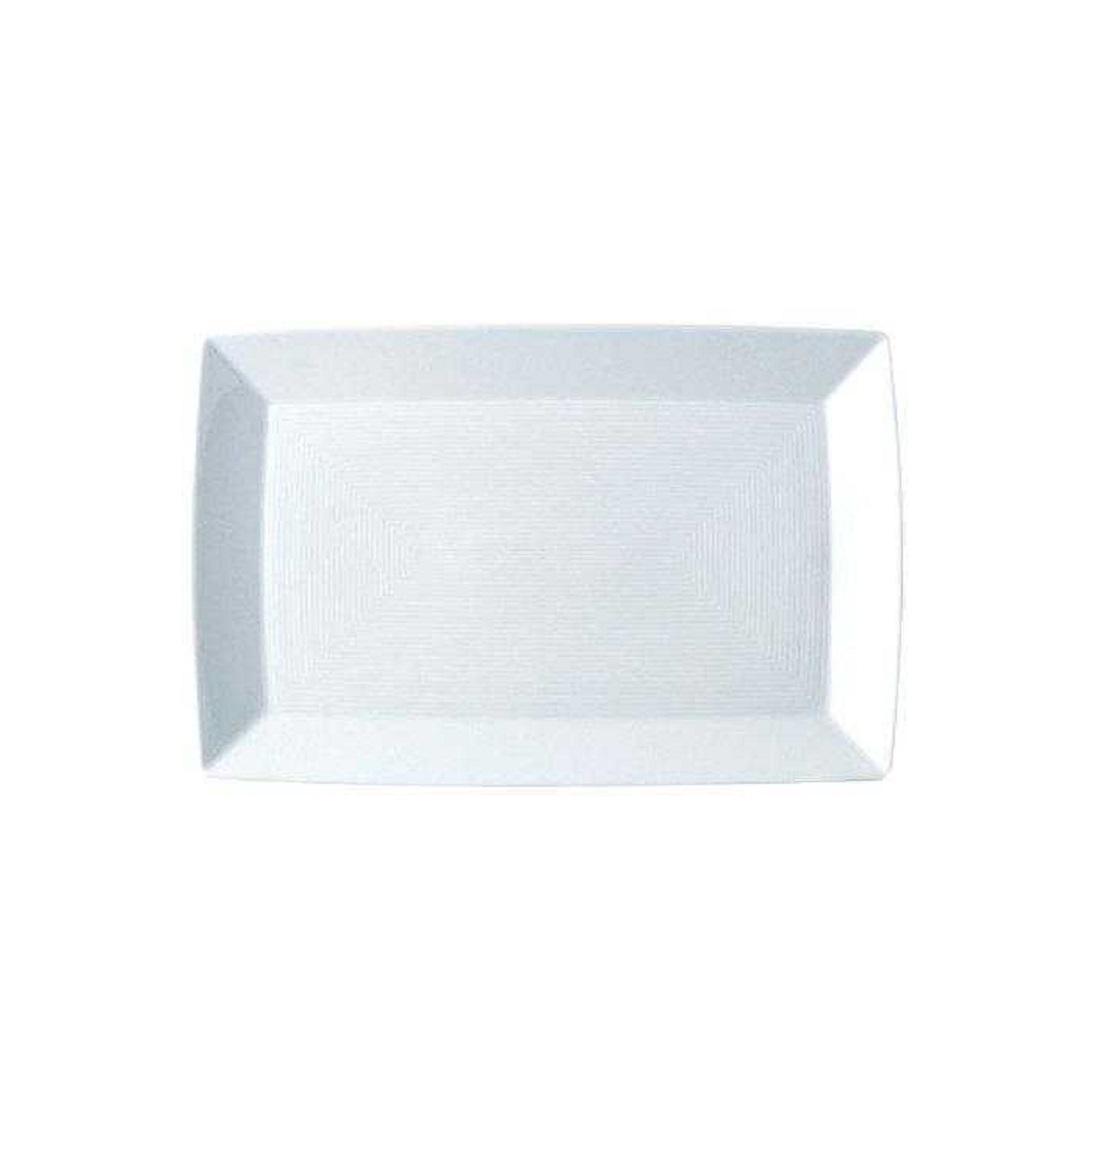 Онлайн каталог PROMENU: Блюдо фарфоровое Rosenthal LOFT, 28,5х18,5 см, белый Rosenthal 11900-800001-12928